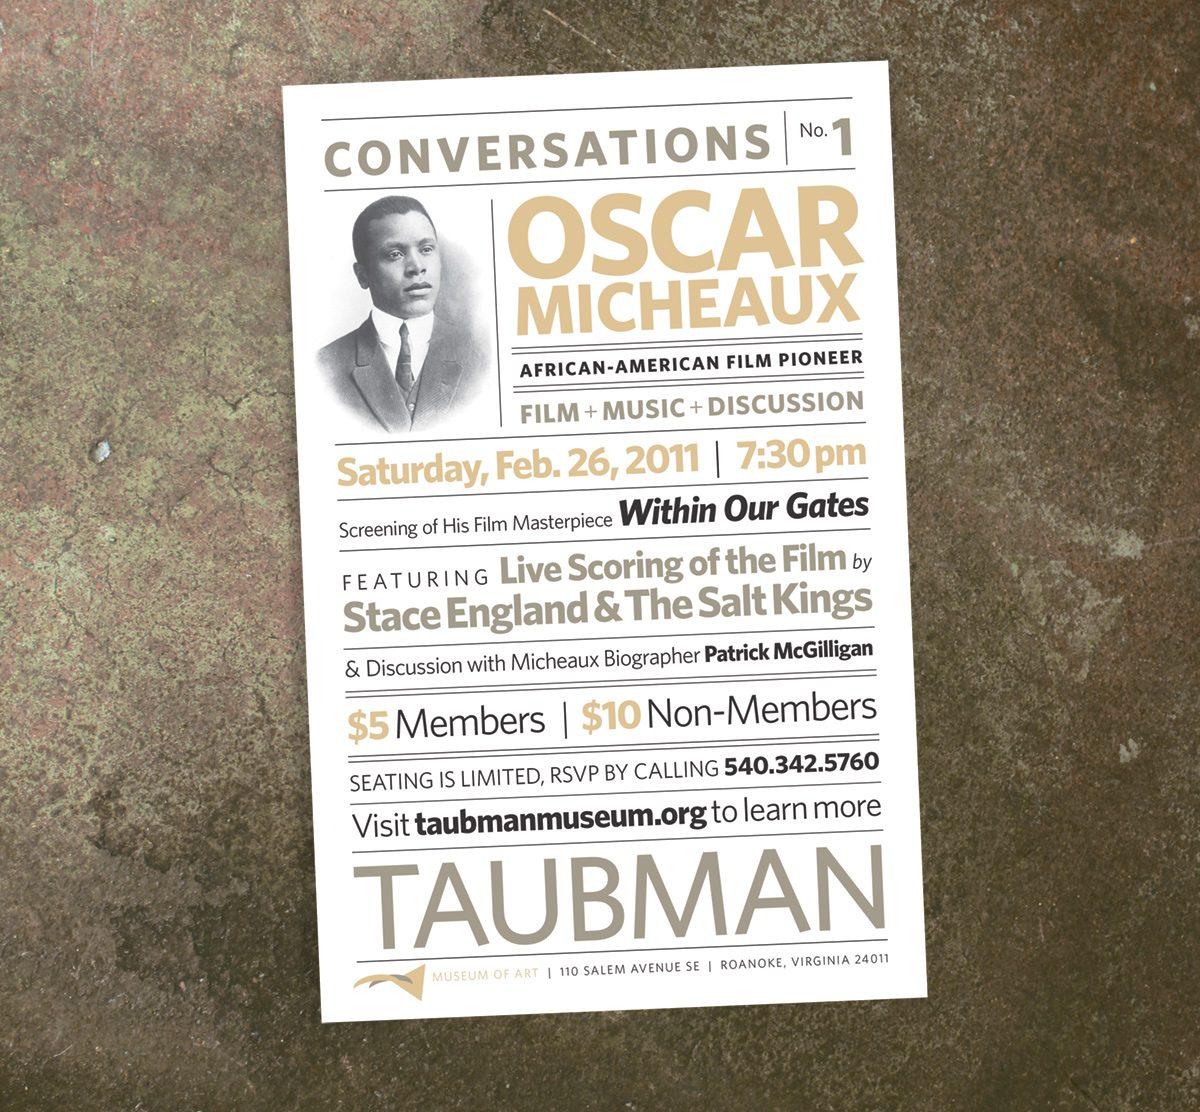 TAUB_Conversations2